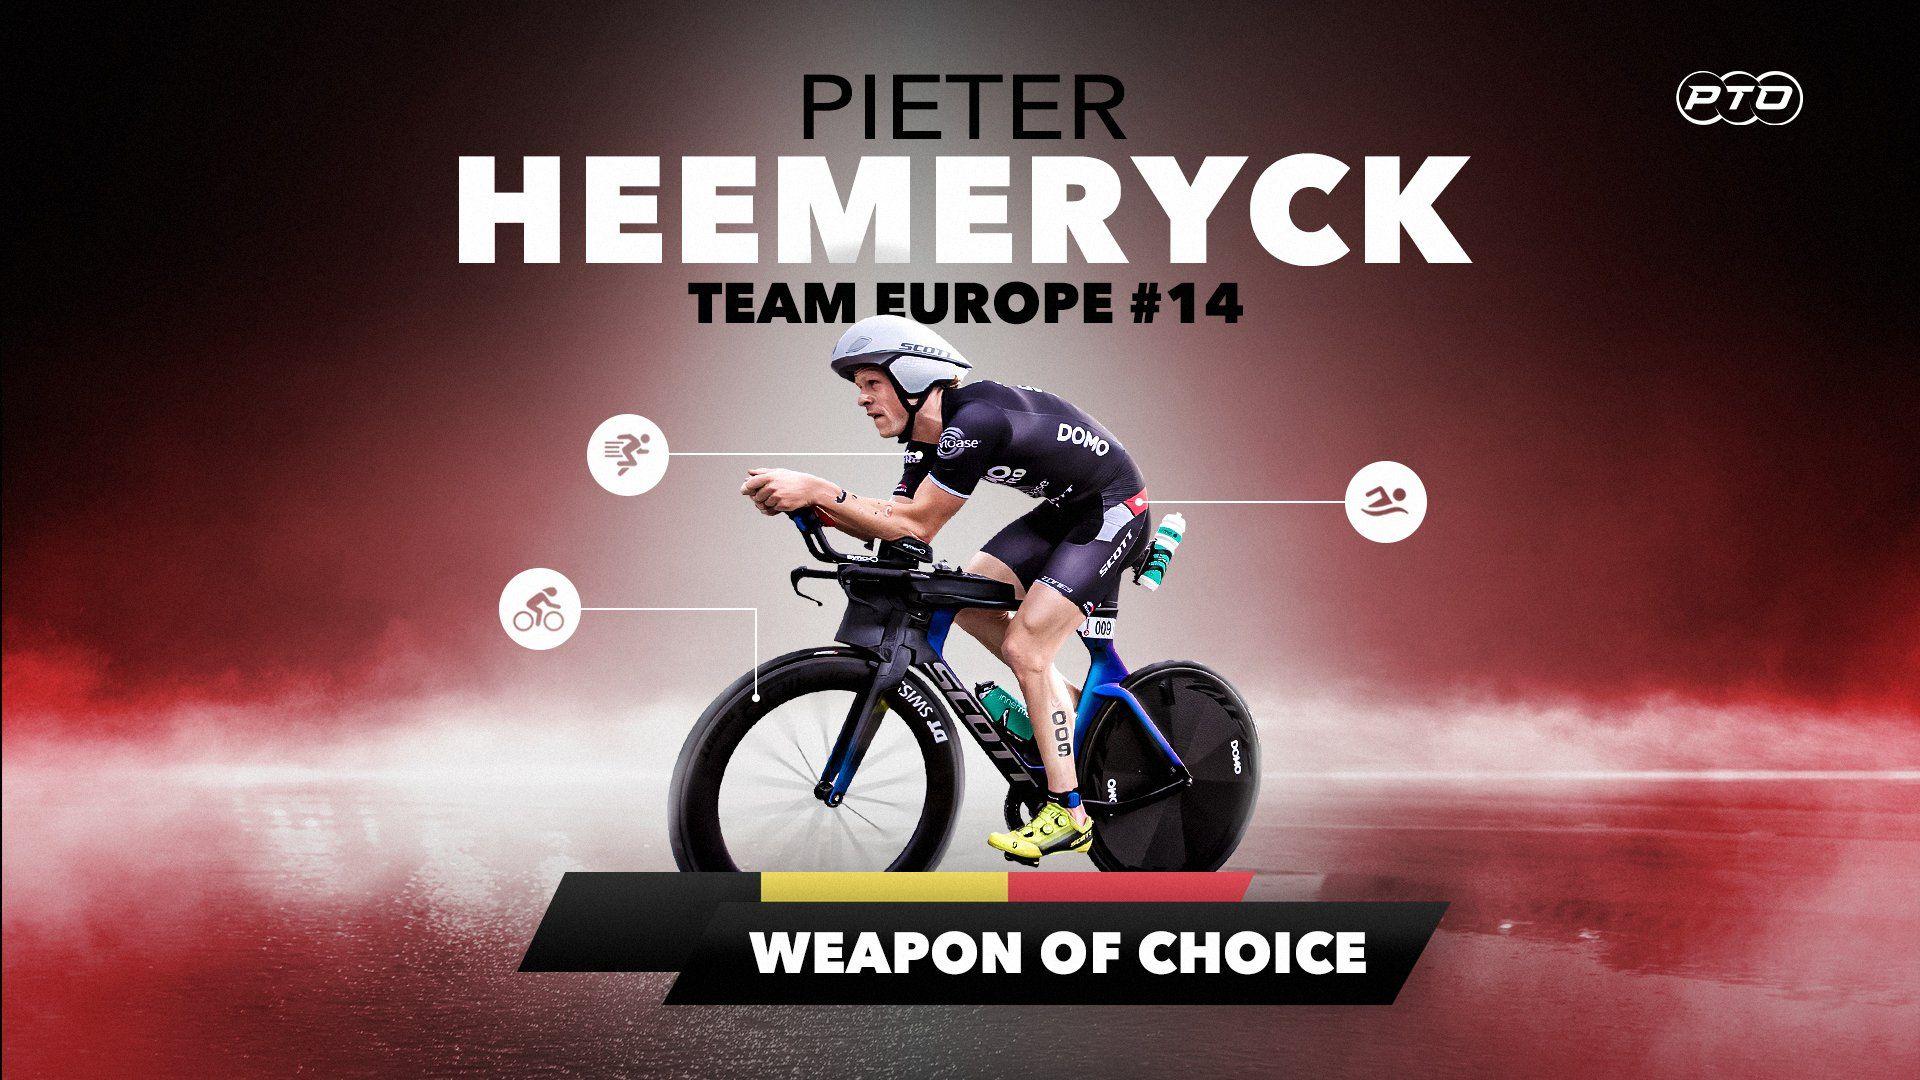 Weapon of Choice || Pieter Heemeryck